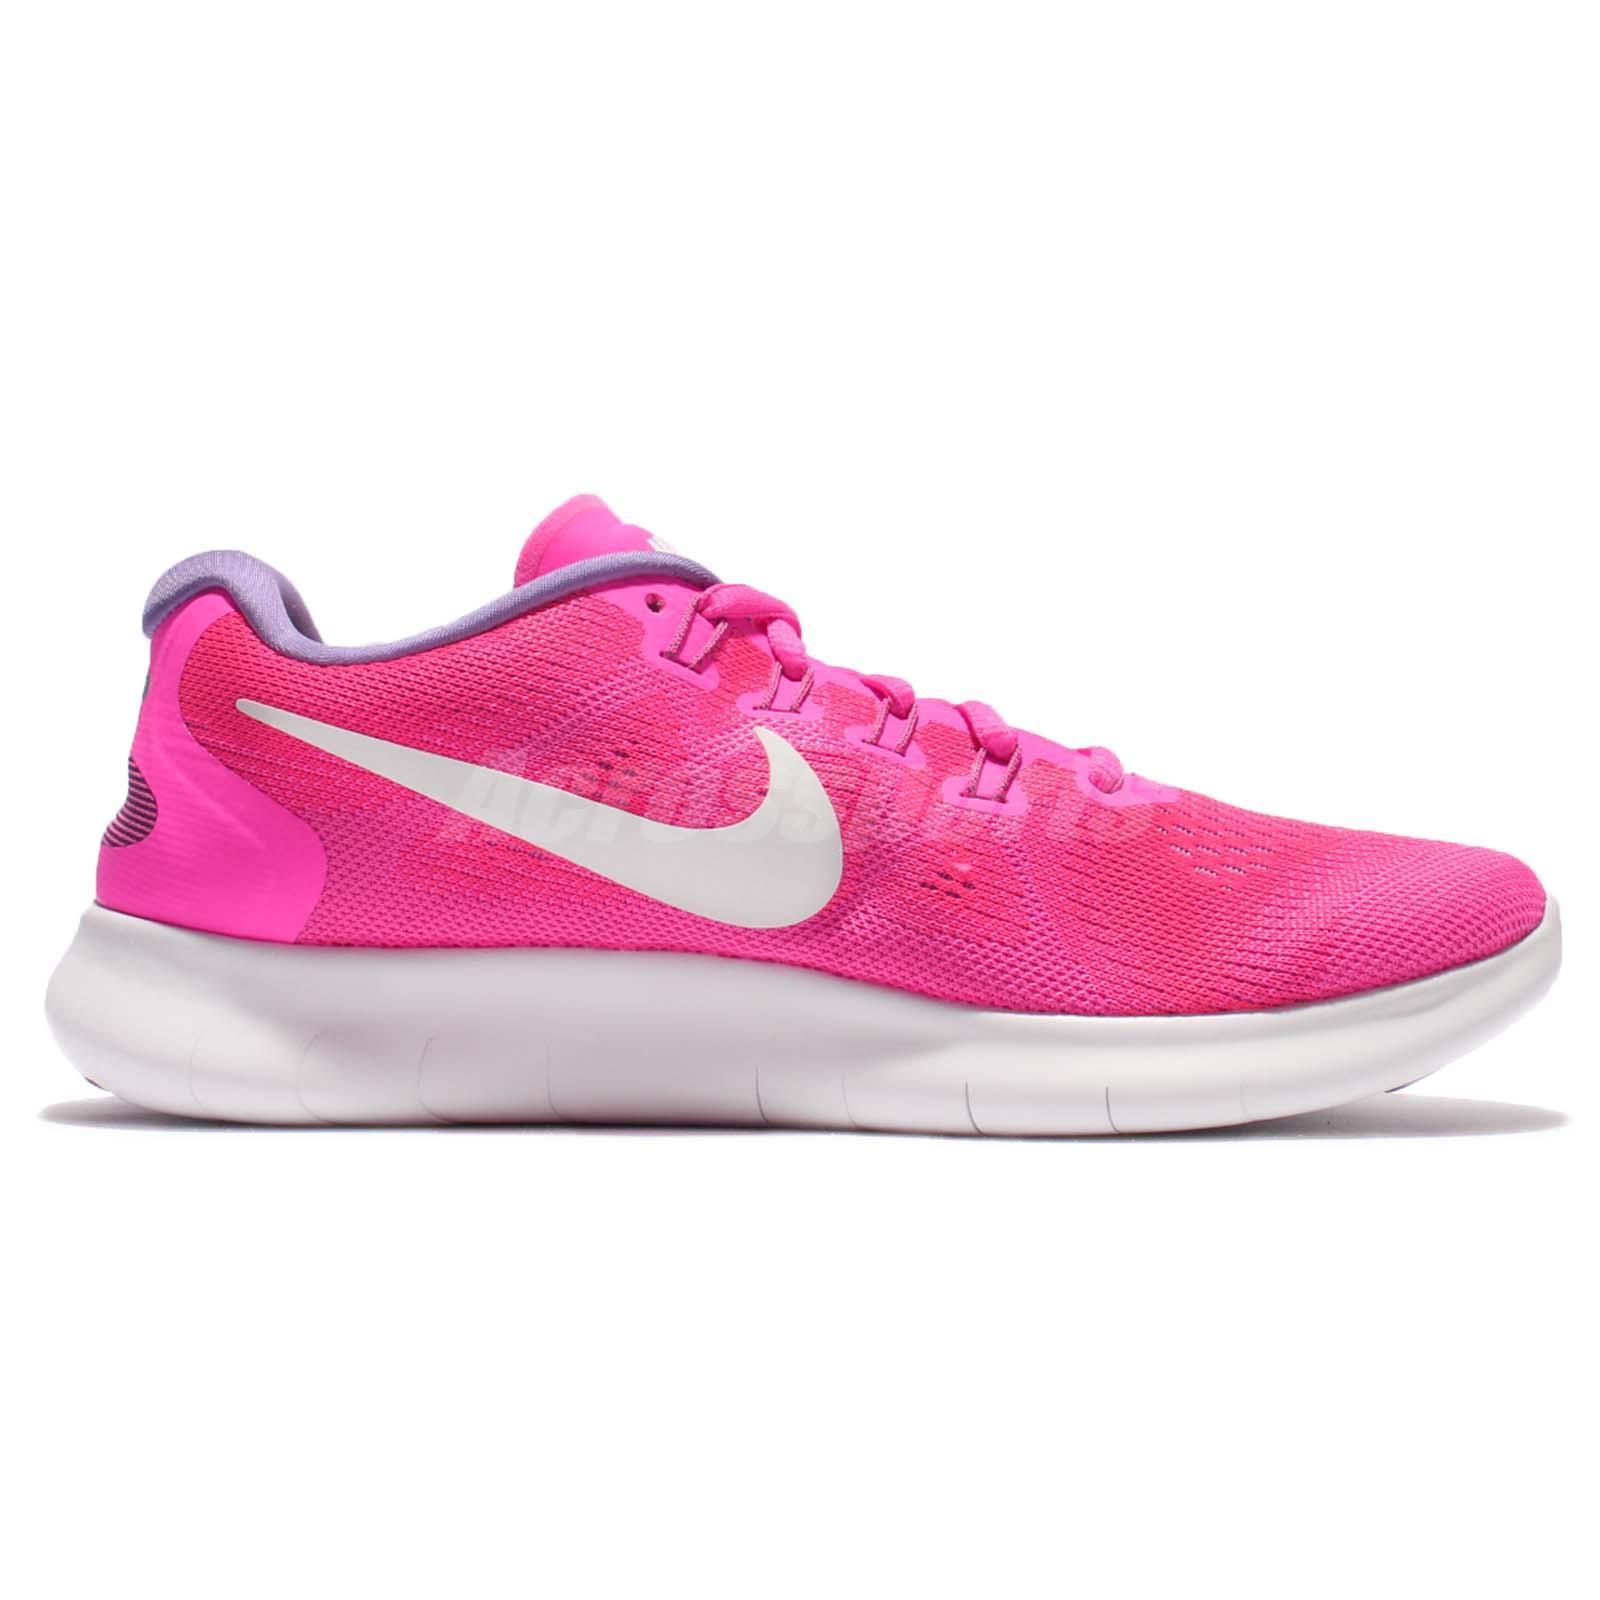 Nike Wmns Free Tr 3 Air Max Turf Shoes  477ebba01